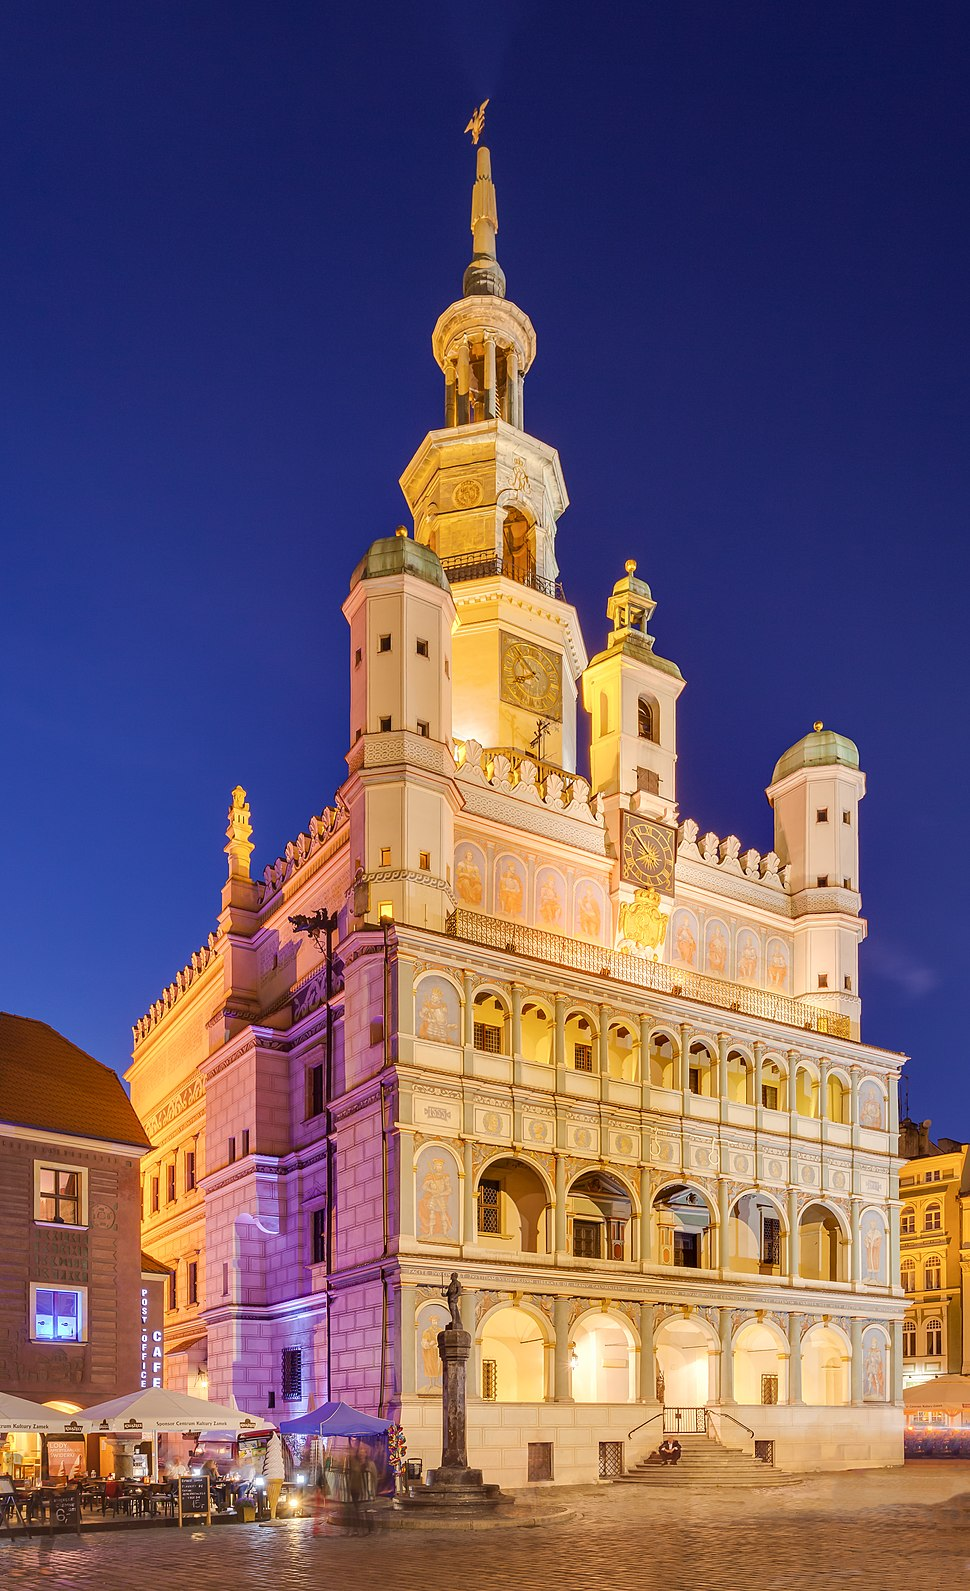 Ayuntamiento, Poznan, Polonia, 2014-09-18, DD 67-72 HDR